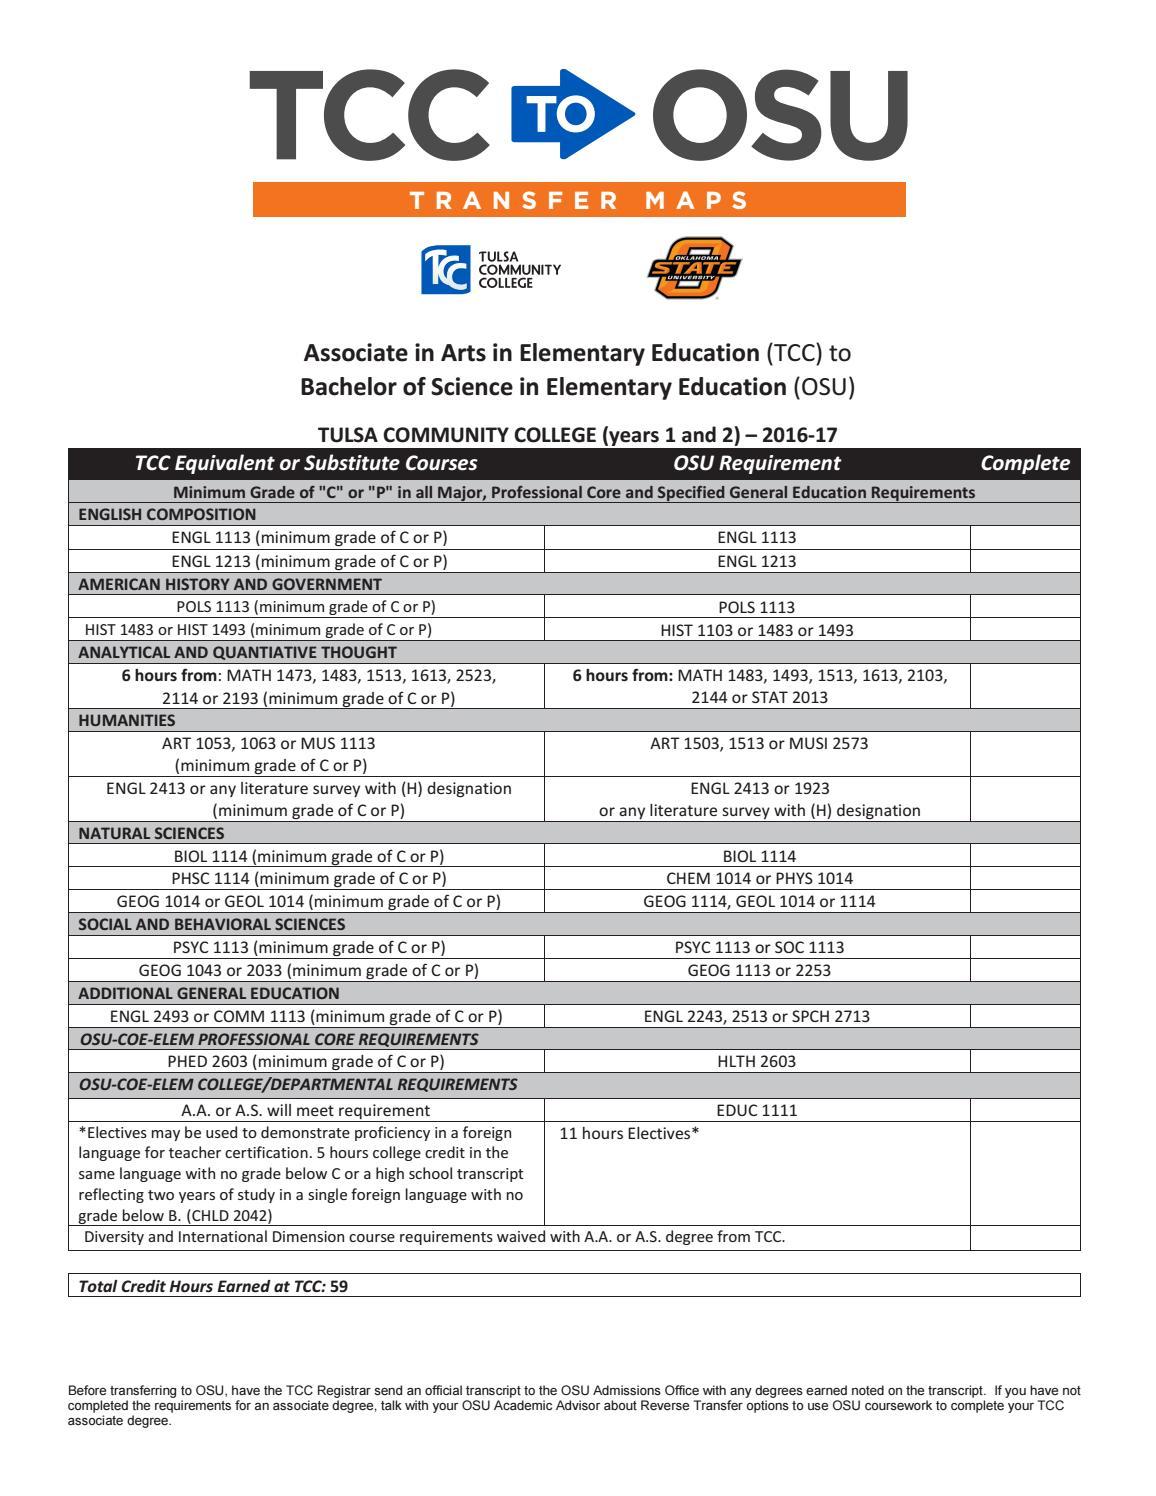 Academic Calendar Osu.Tcc To Osu Elementary Education 2016 17 Course Transfer Map By